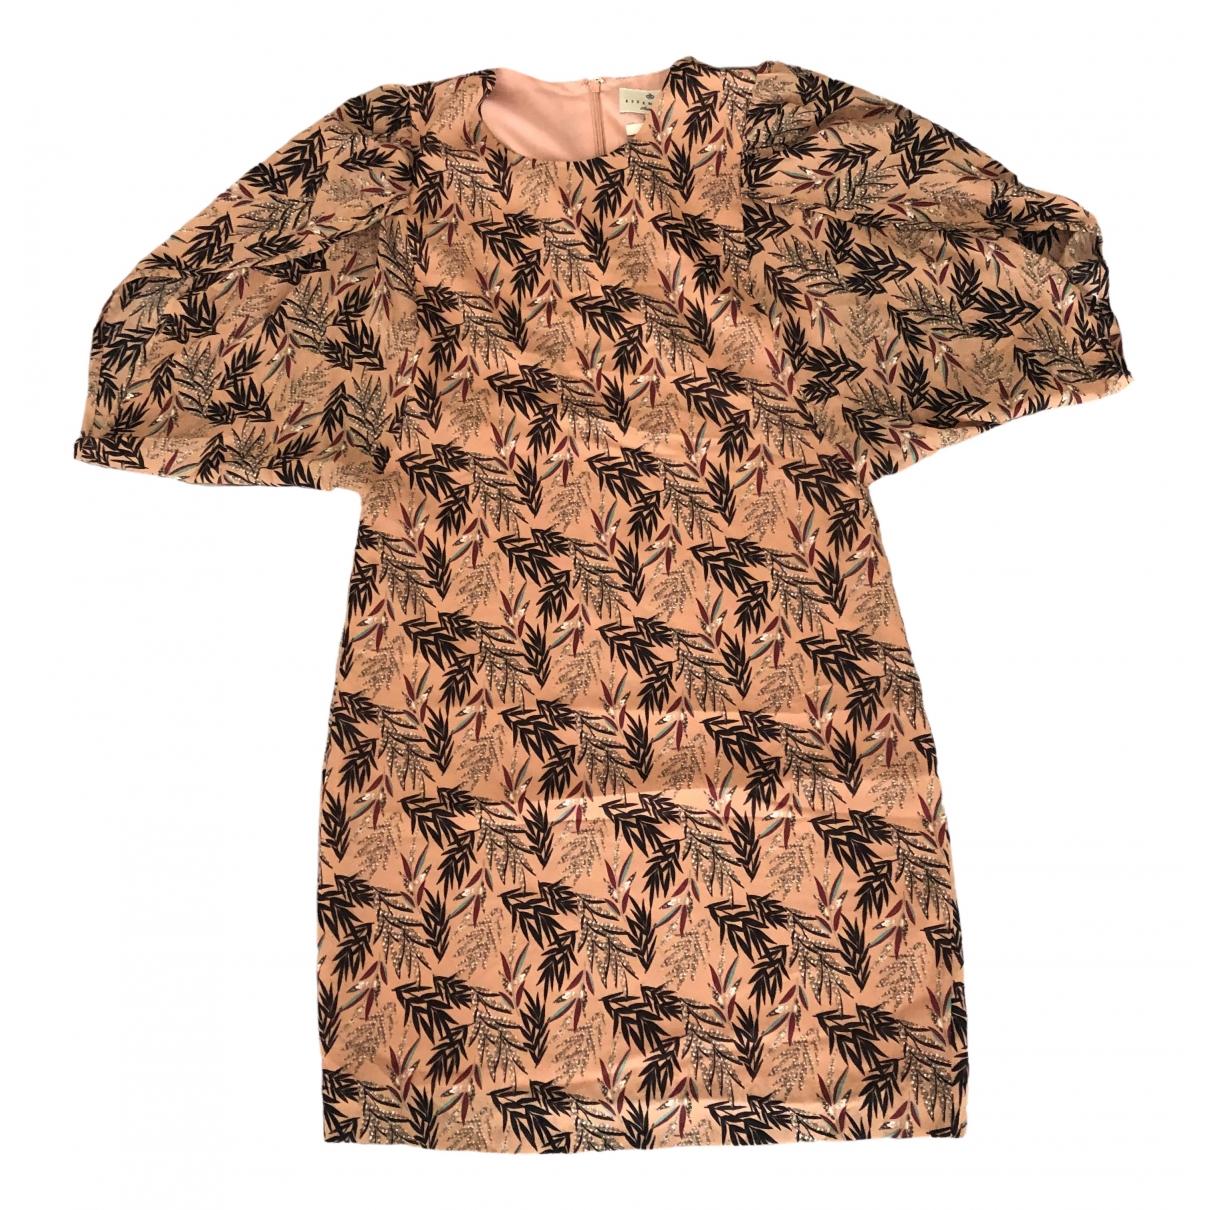 Essentiel Antwerp \N Multicolour Silk dress for Women 36 FR